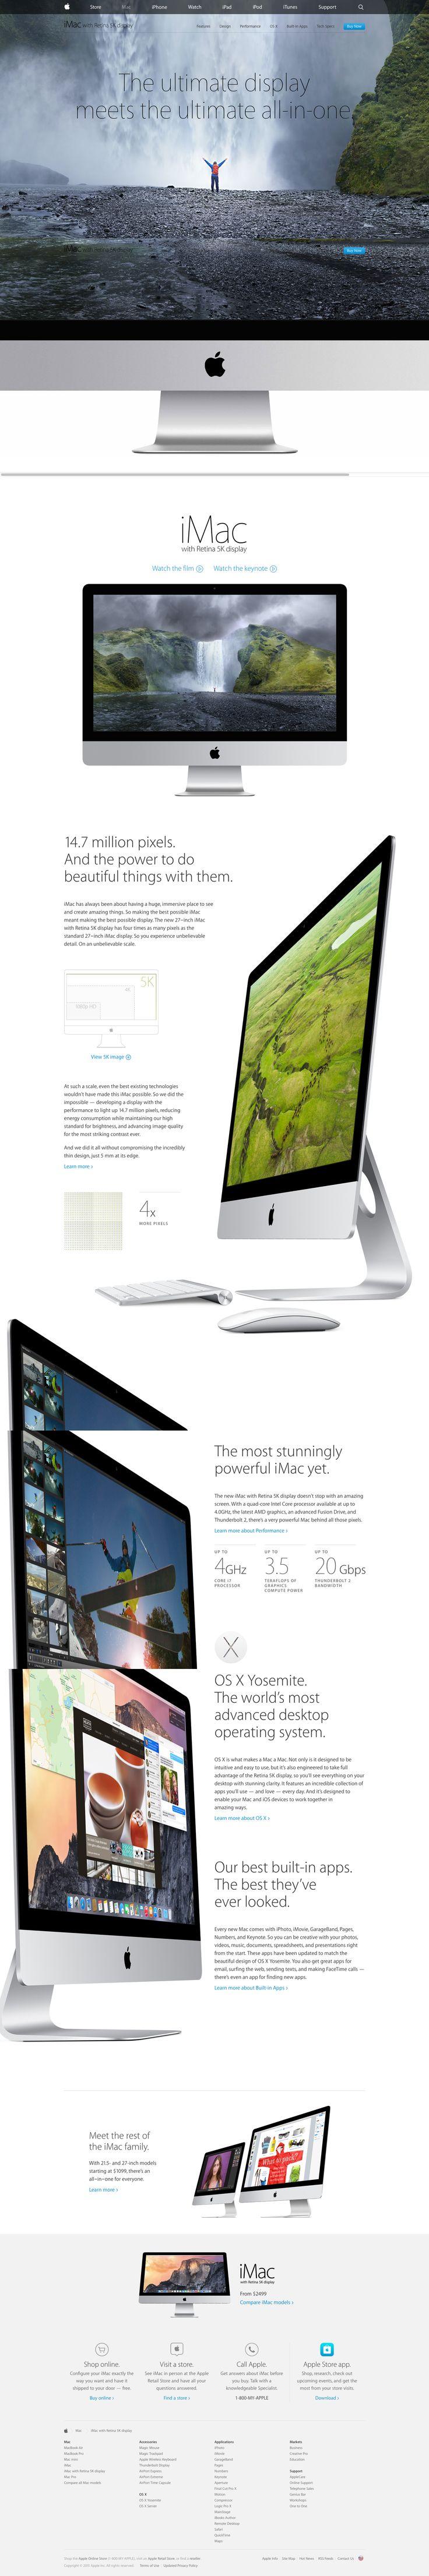 http://www.apple.com/imac-with-retina/